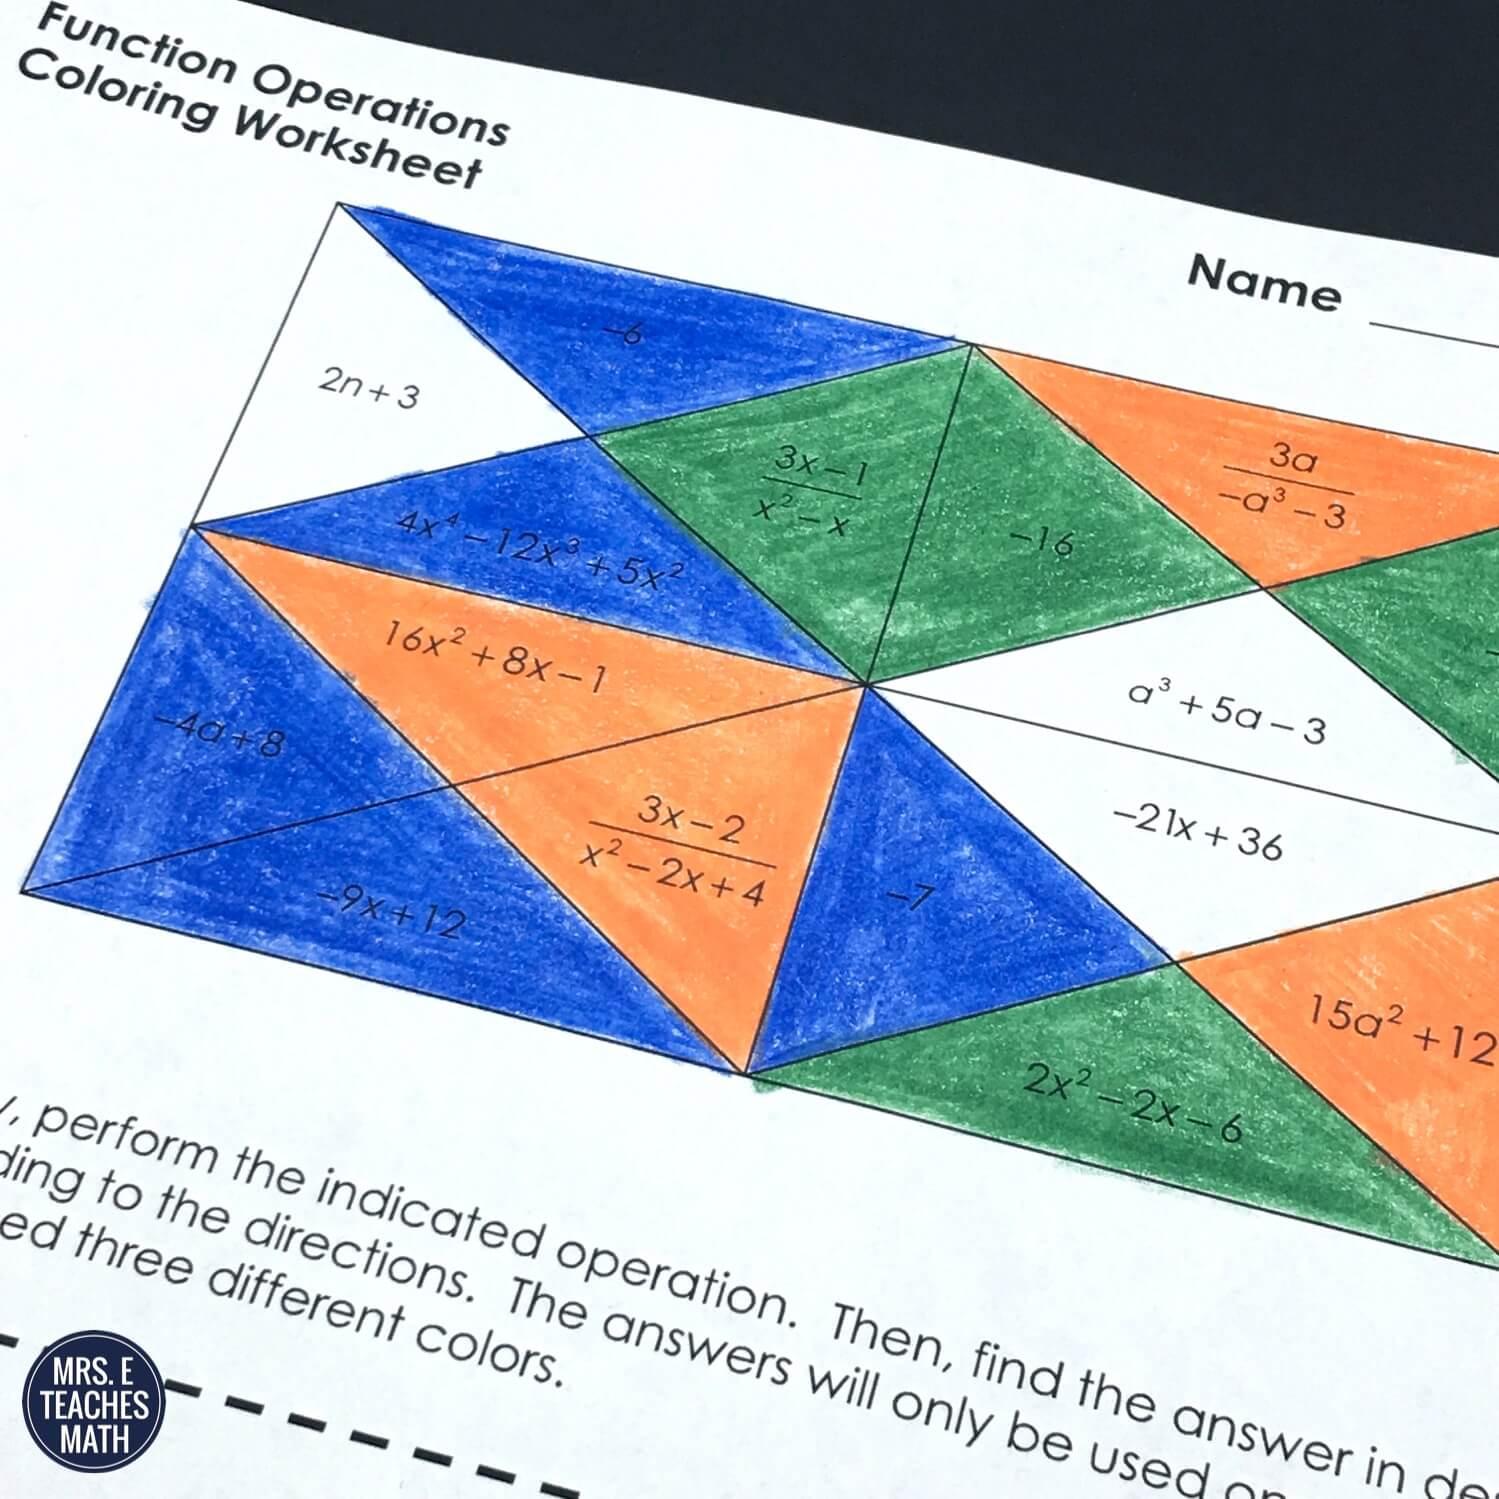 8 Ideas for Teaching Function Notation   Mrs. E Teaches Math [ 1499 x 1499 Pixel ]